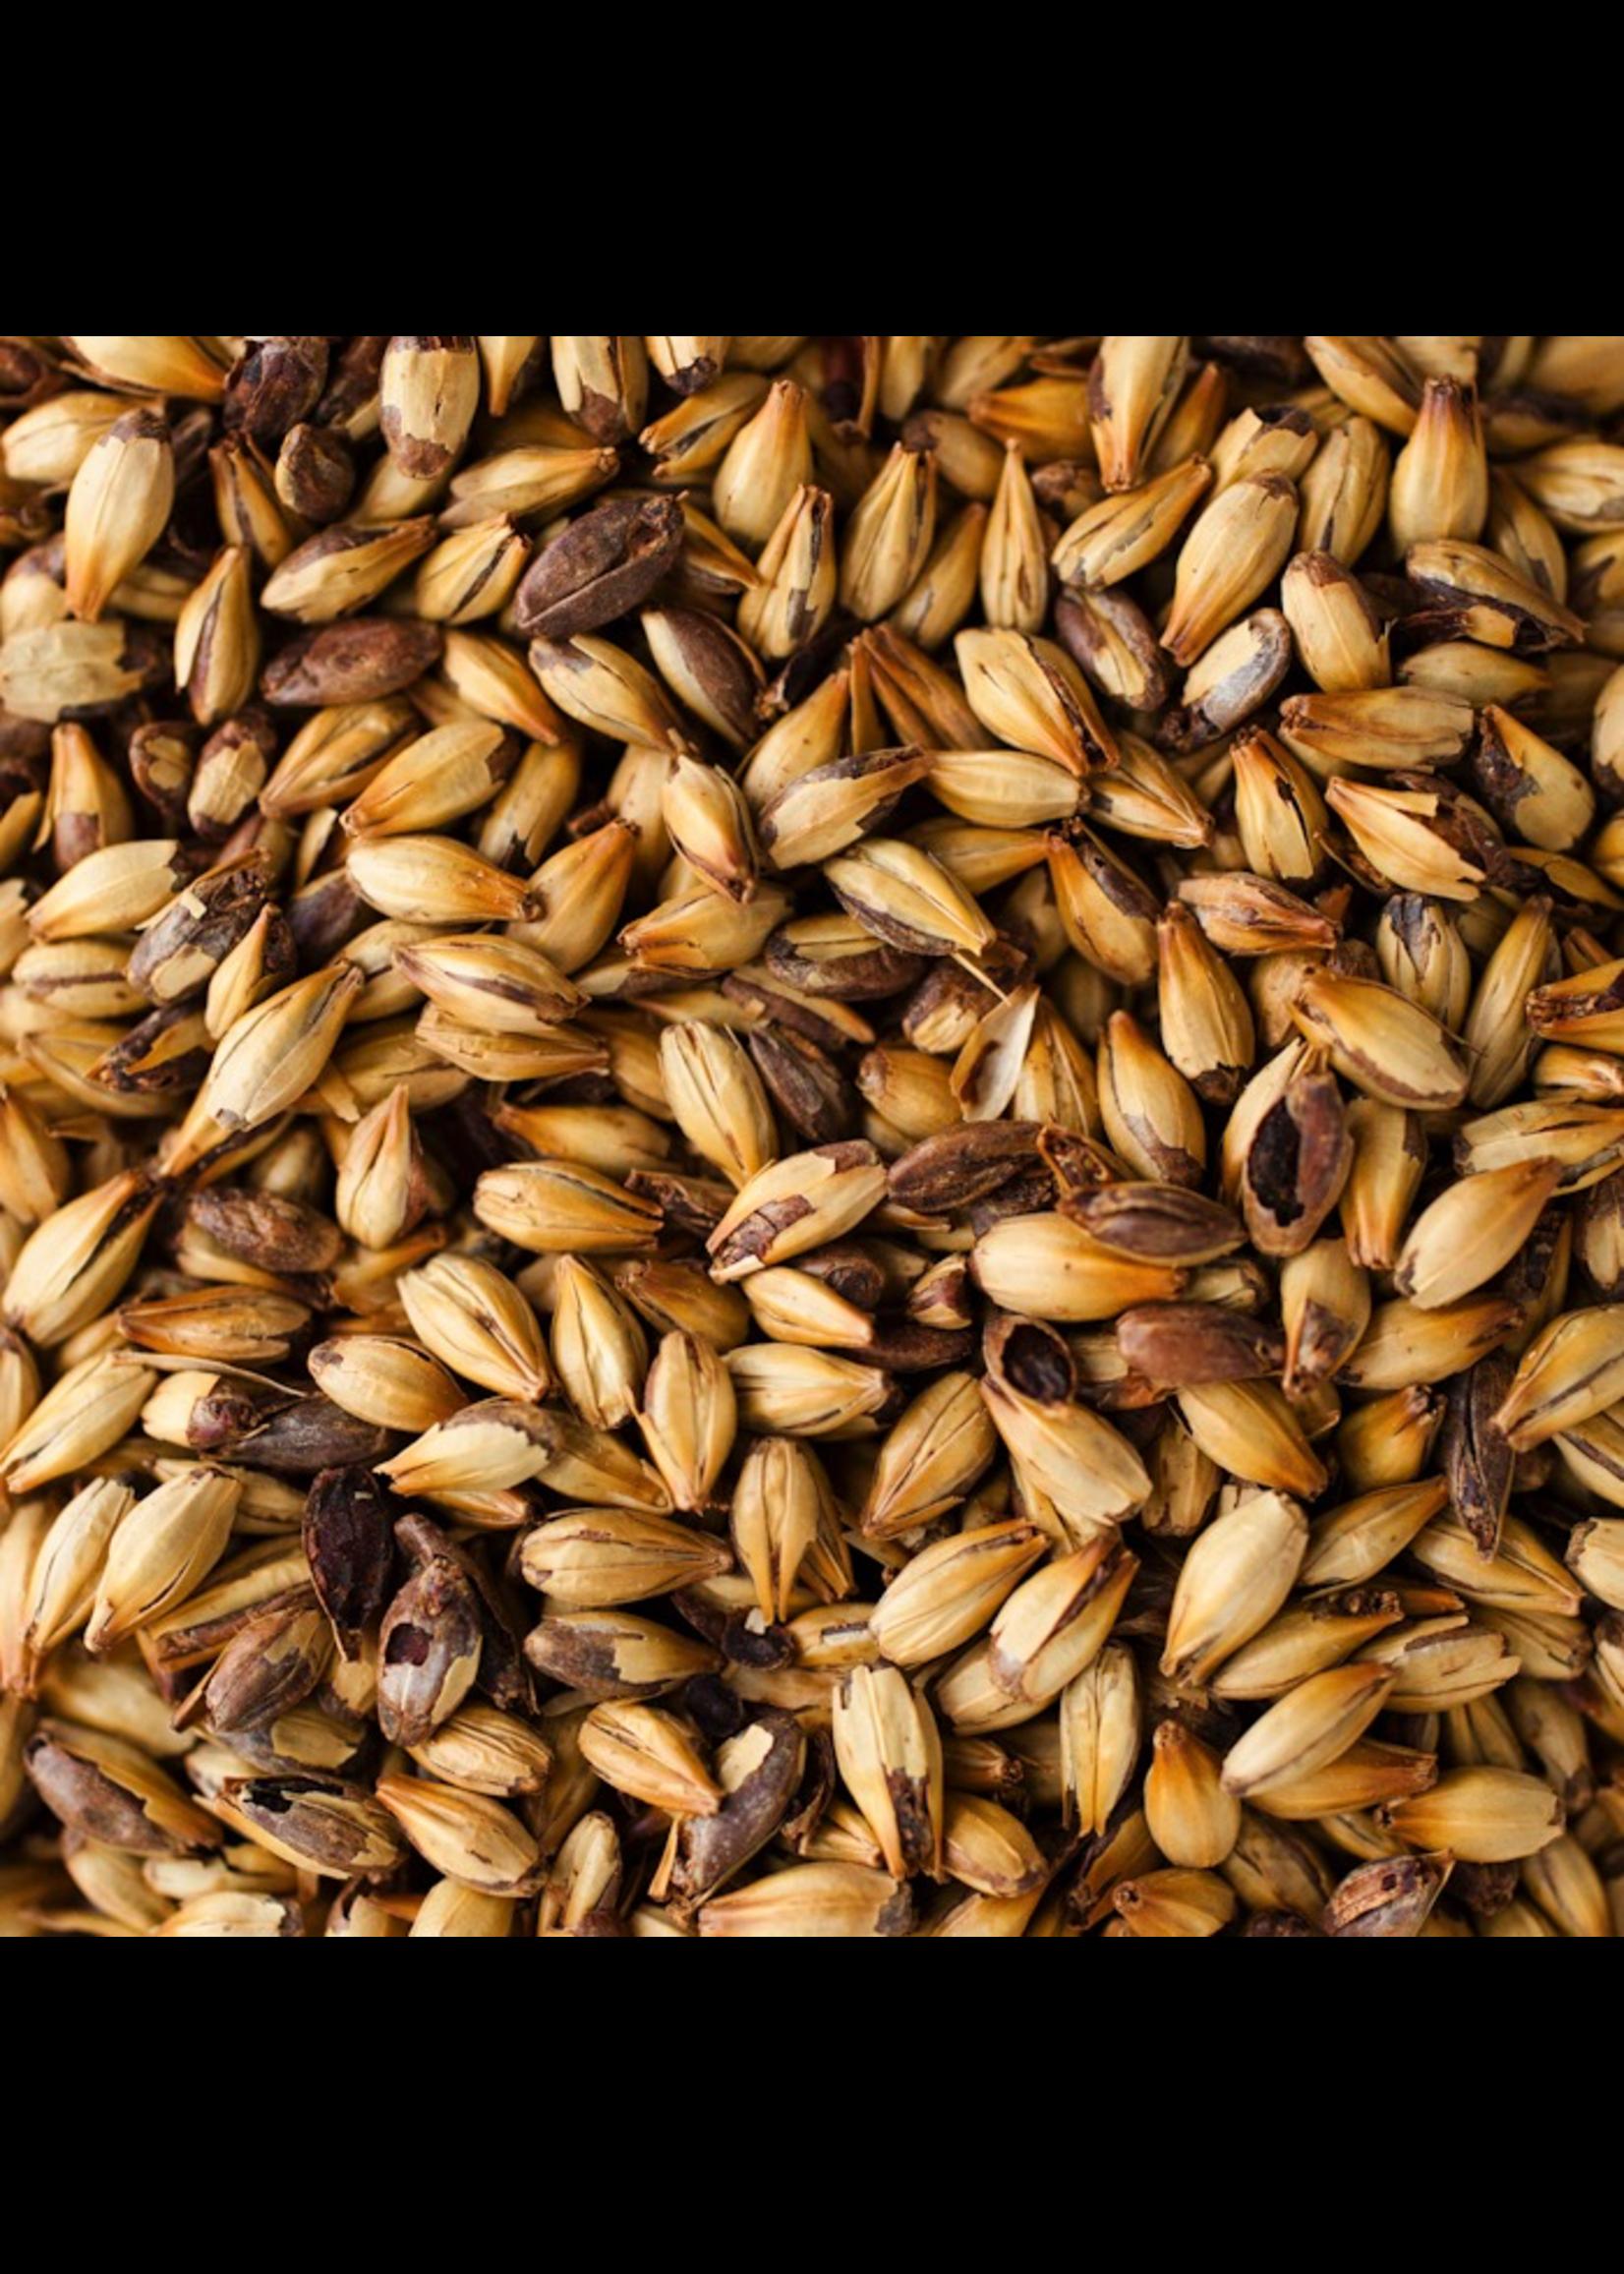 Grain Briess Caramel Munich 60L - 50 LB